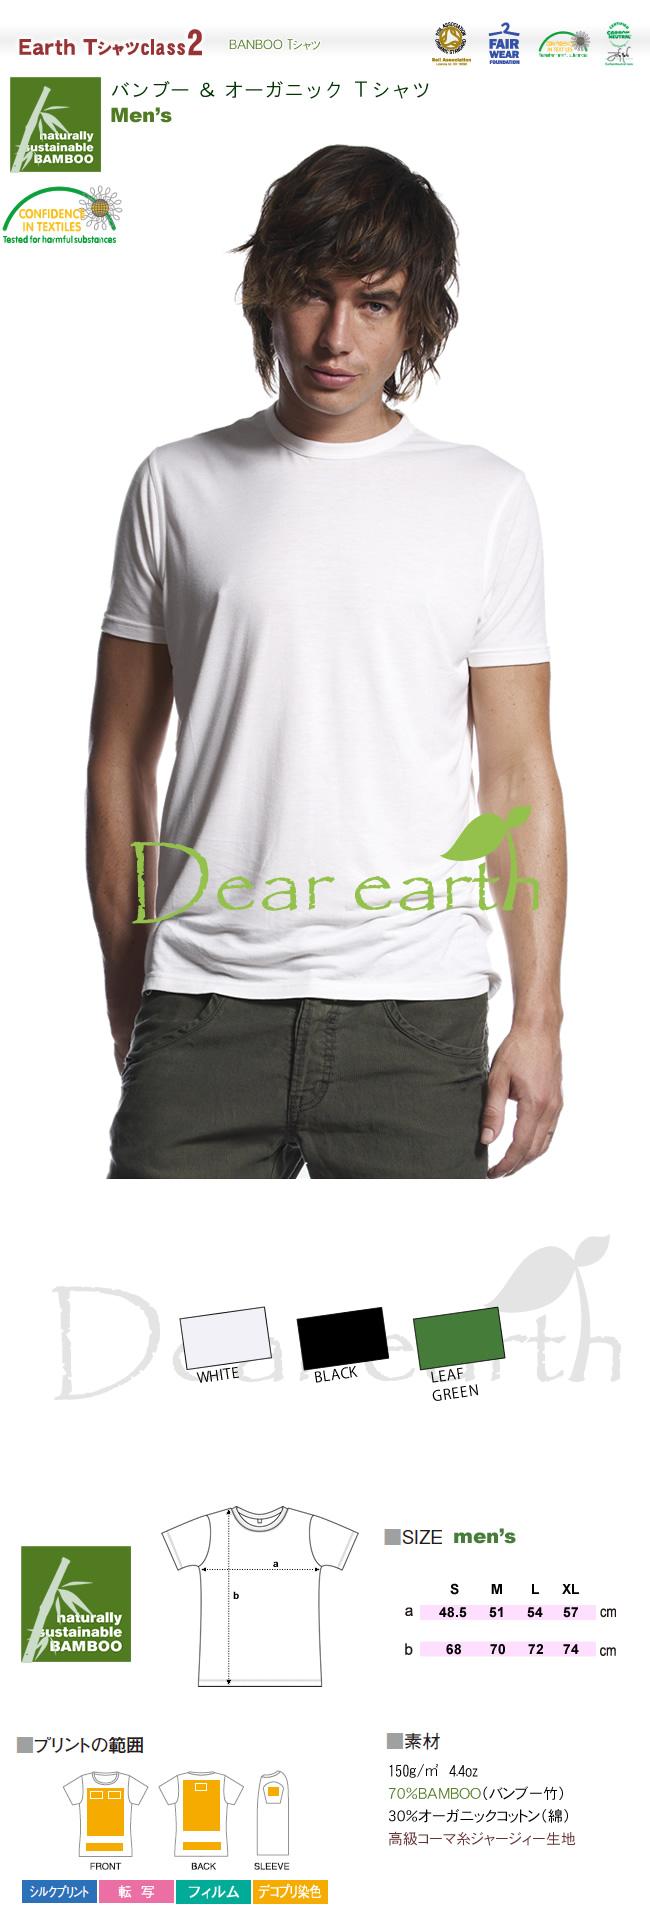 MEN'Sバンブー素材Tシャツclass2(EC45)